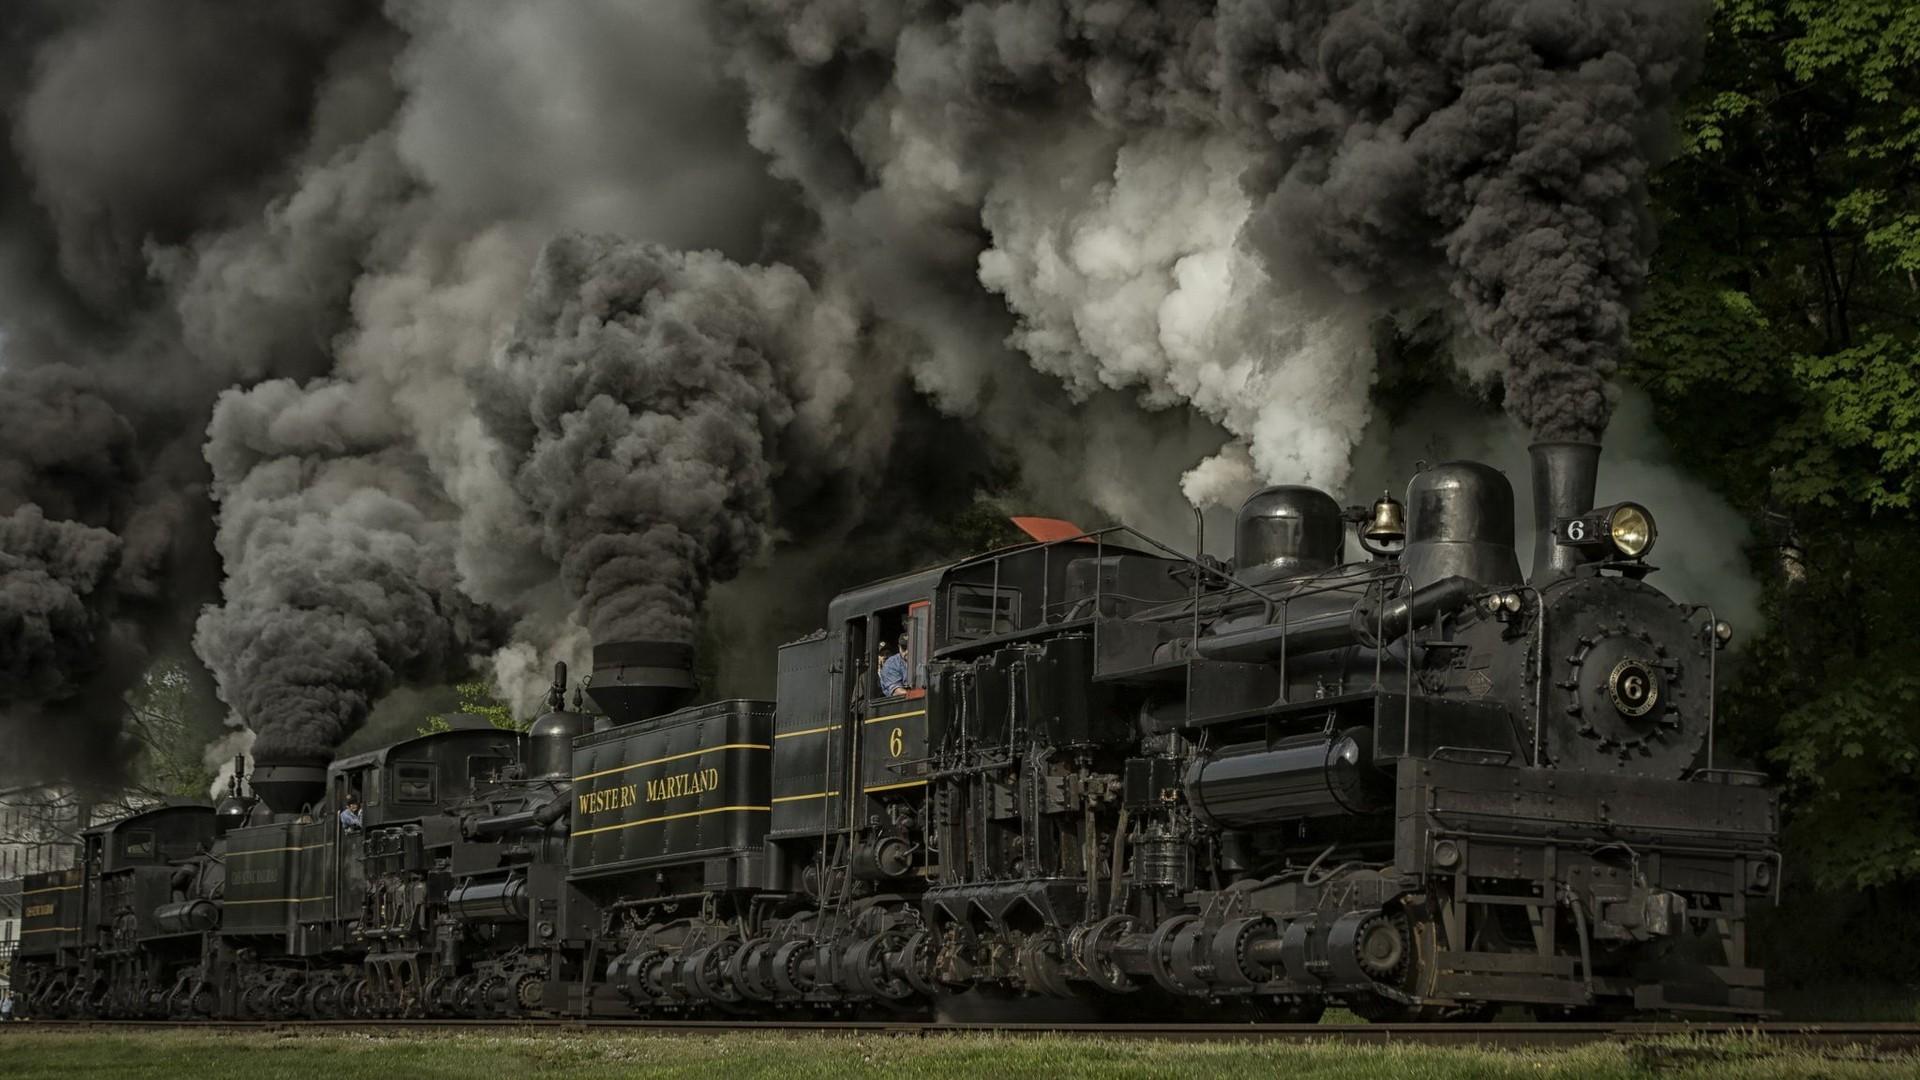 Steam locomotive in the cloud of black smoke